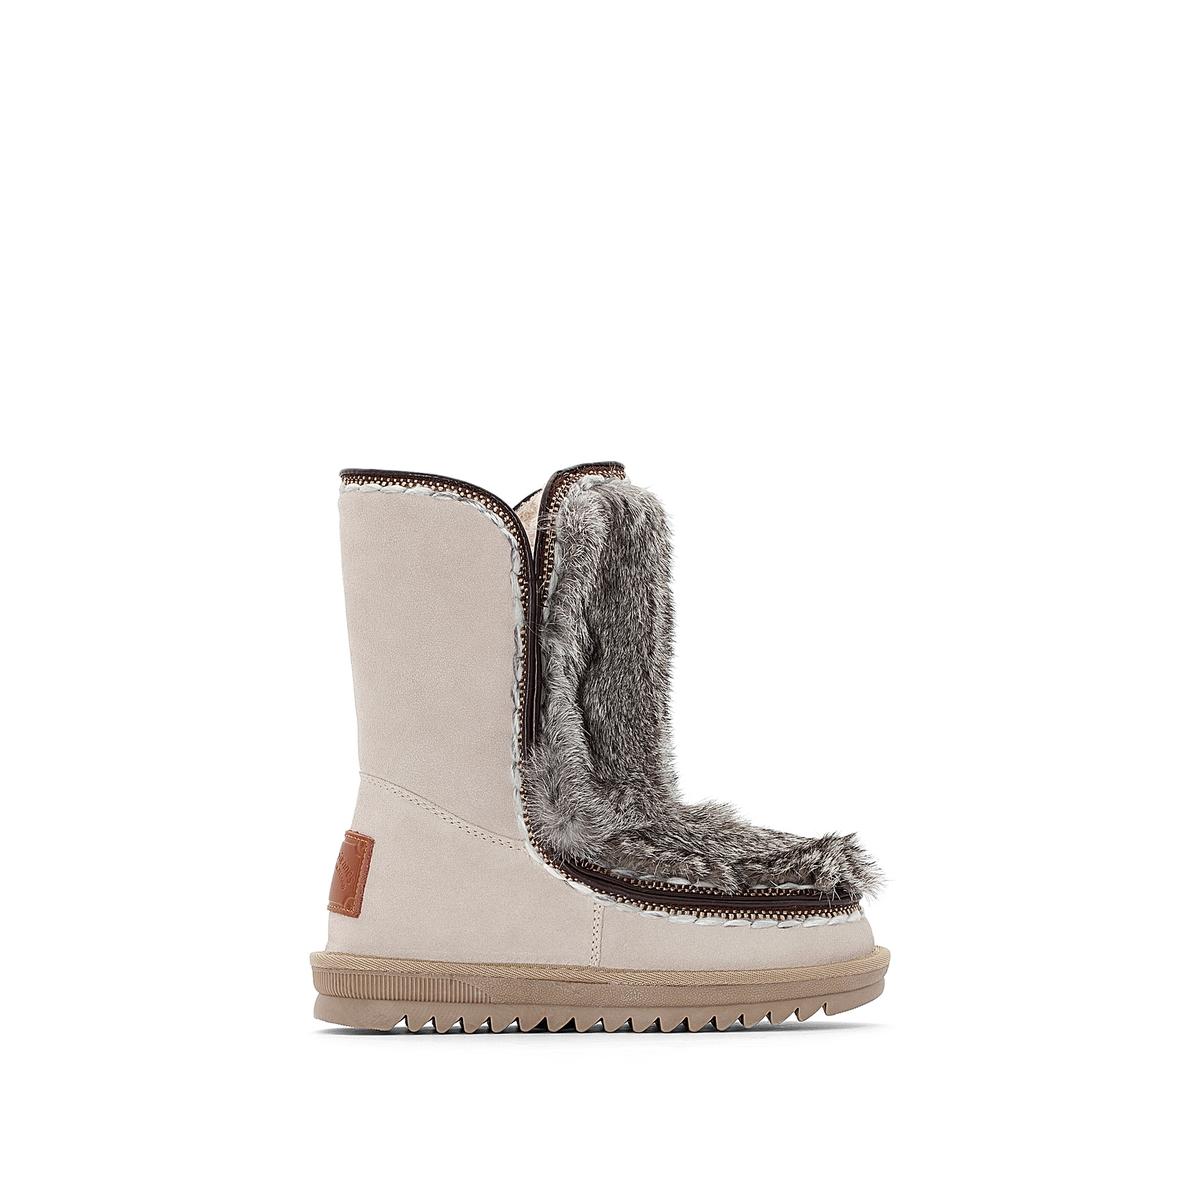 Сапоги кожаные на меху Joana цены онлайн